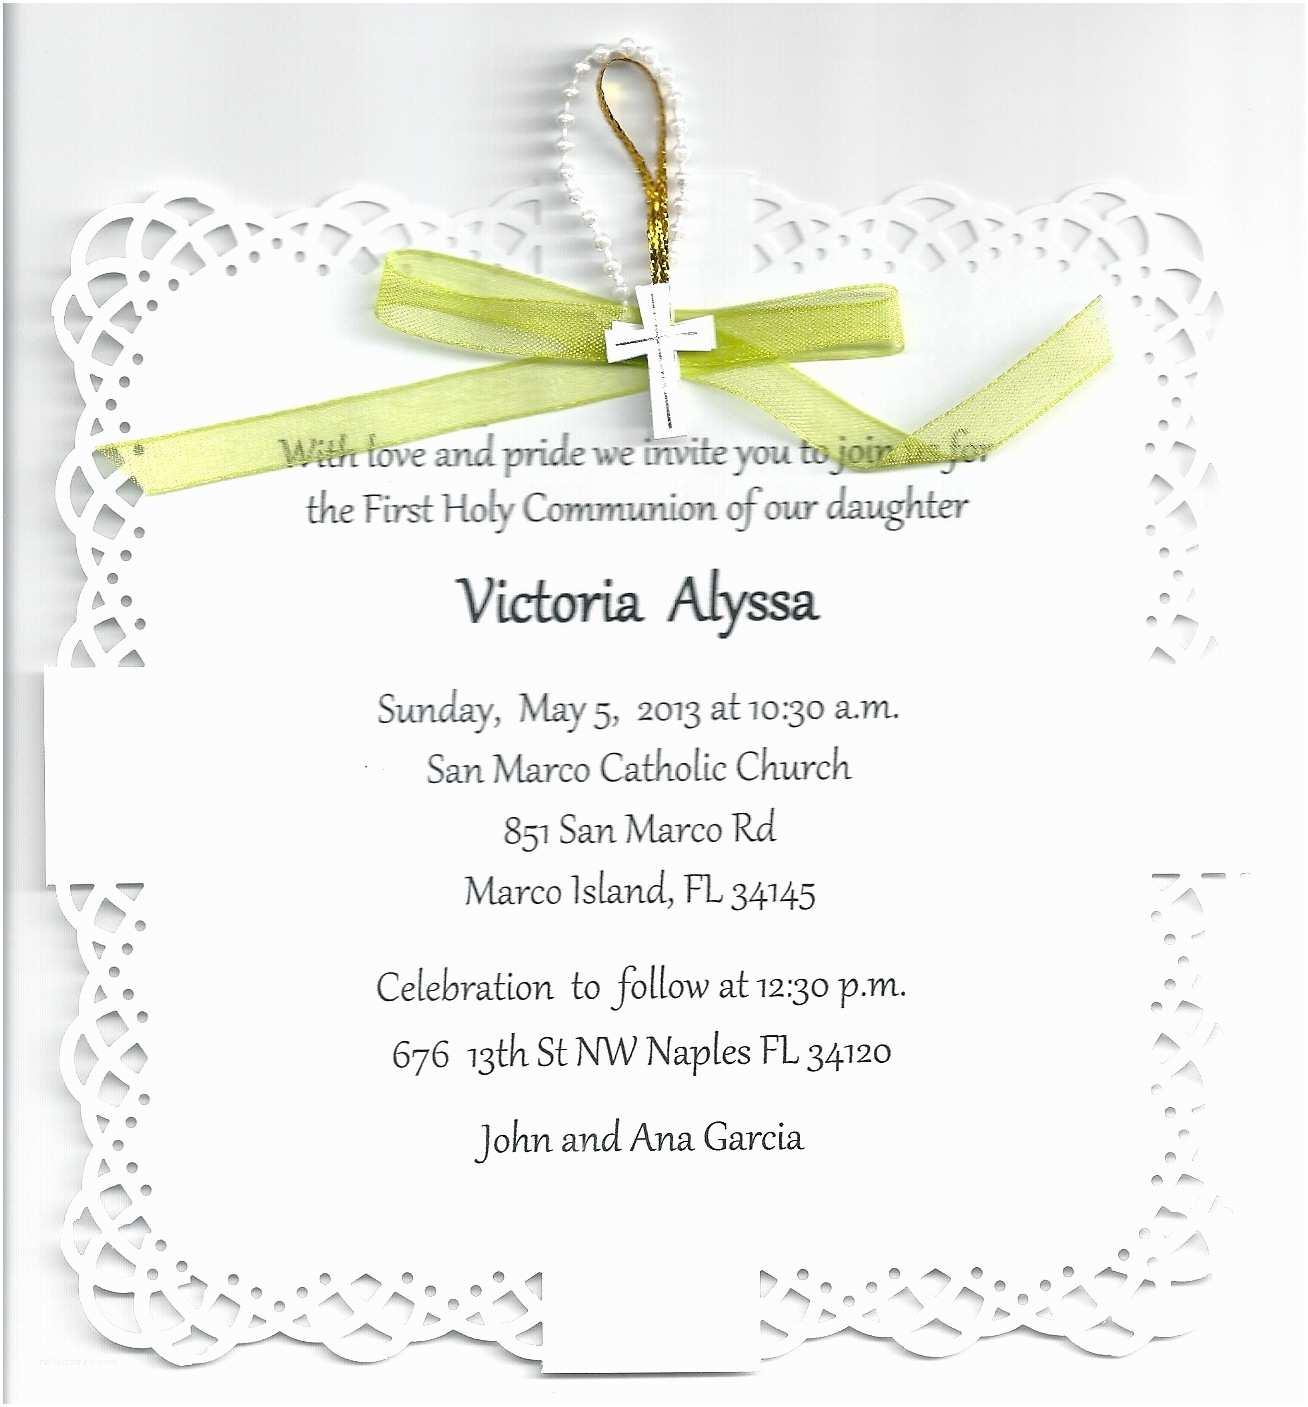 First Communion Invitation Wording Impressive First Munion Invitation Design Ideas Emuroom